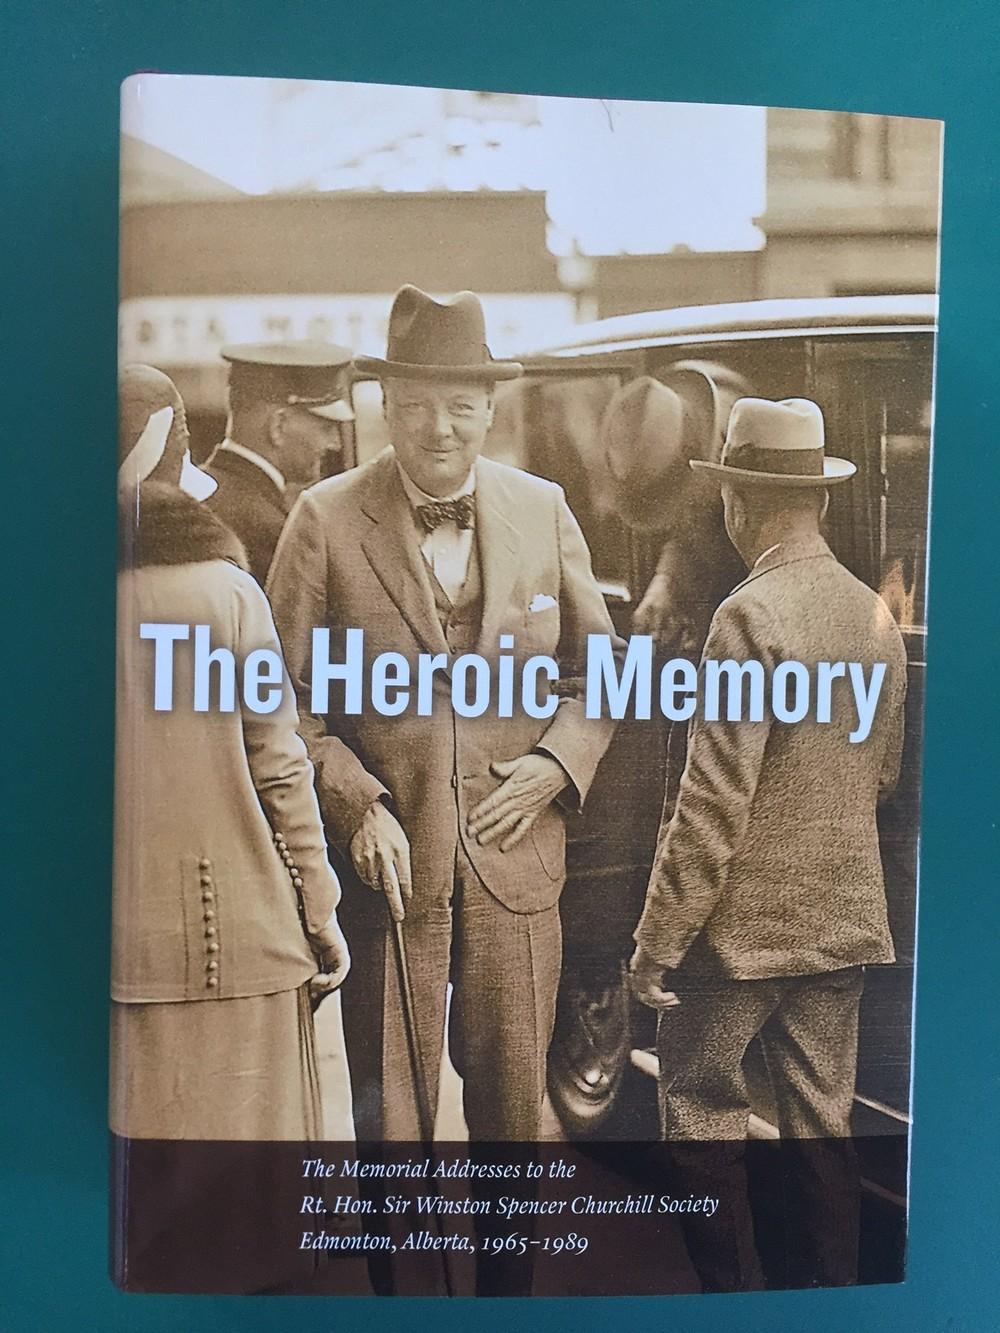 The Heroic Memory, Vol. I (2005)